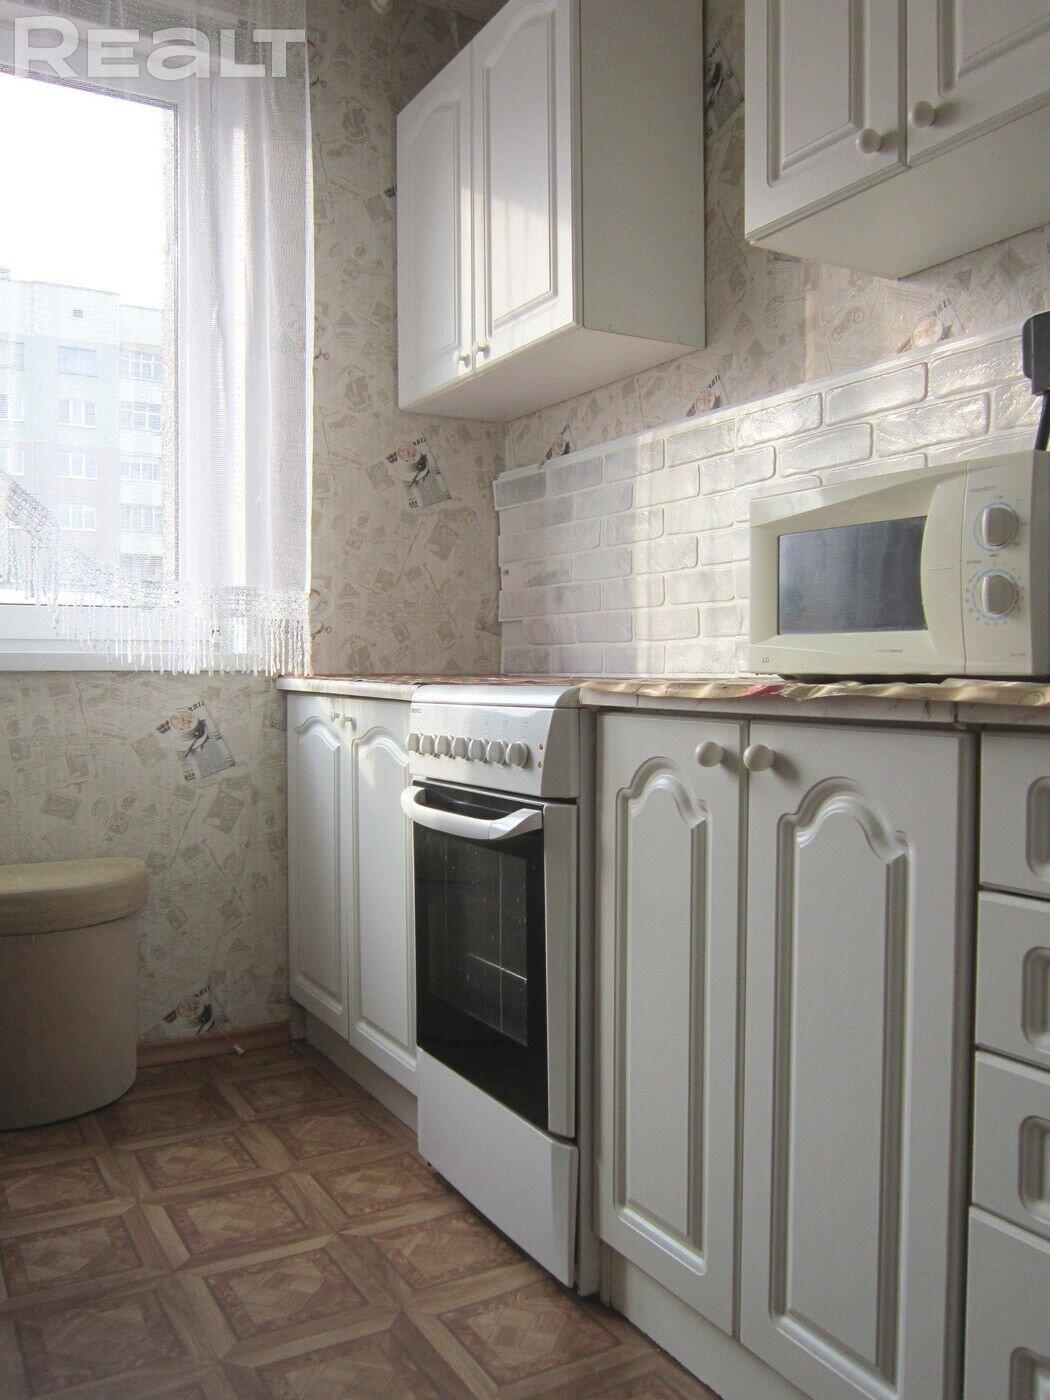 Продажа 3-х комнатной квартиры в г. Минске, ул. Корженевского, дом 10 (р-н Курасовщина). Цена 169 144 руб c торгом